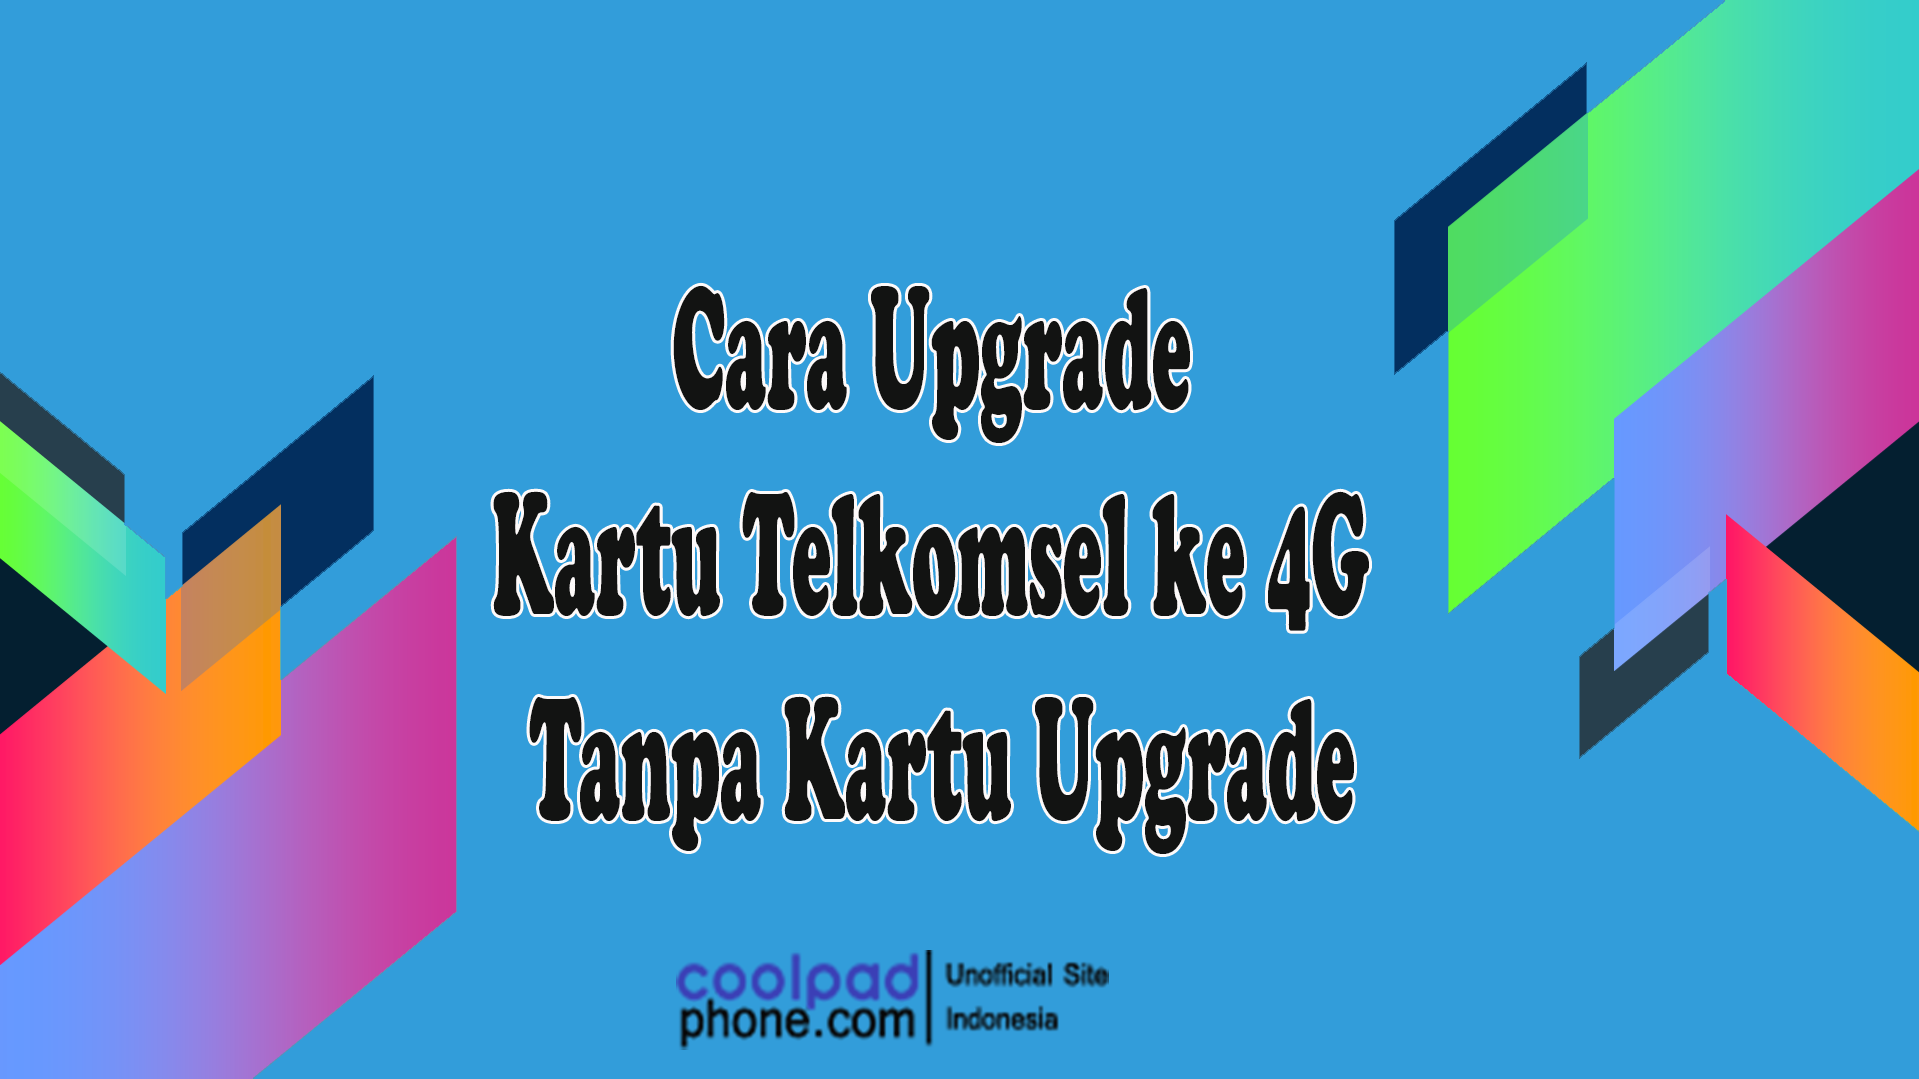 Cara Upgrade Kartu Telkomsel ke 4G Tanpa Kartu Upgrade